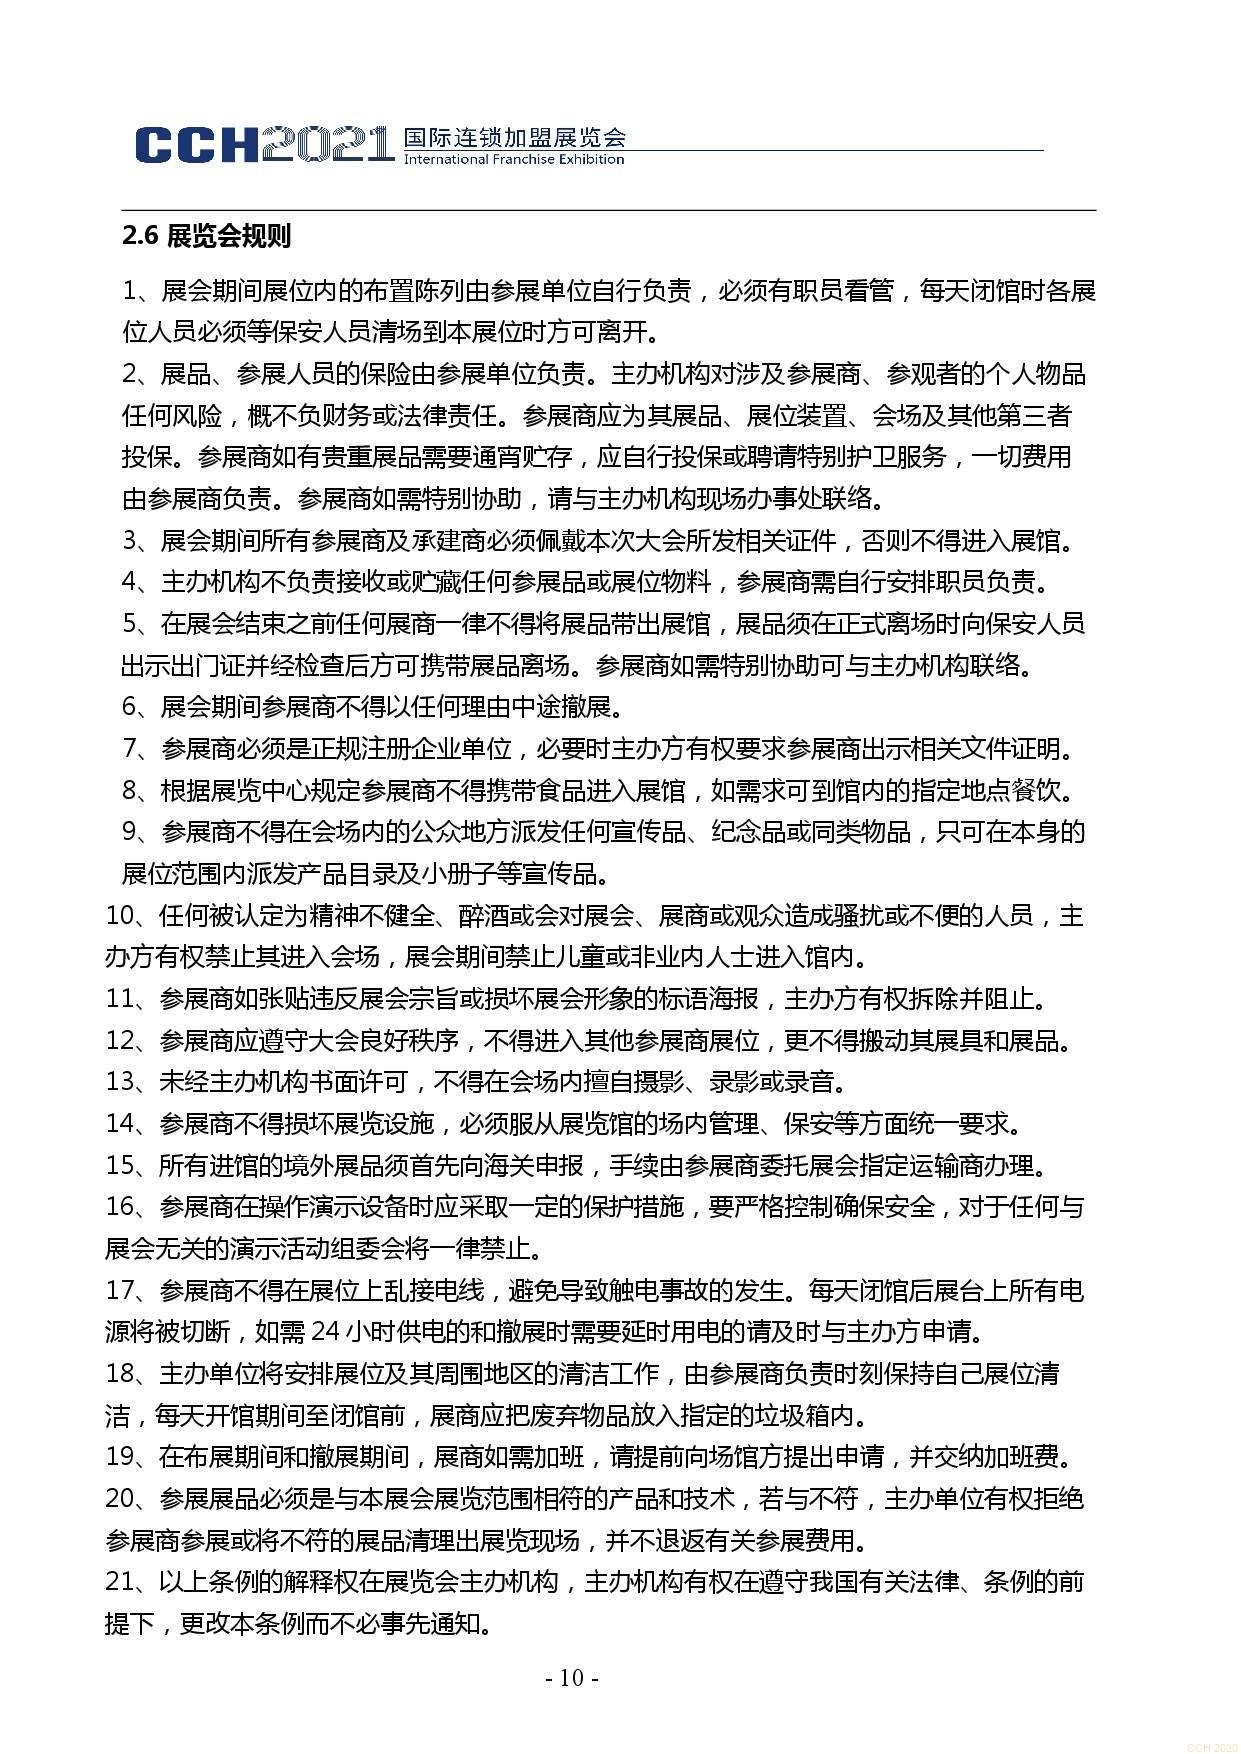 0416CCH深圳展参展商手册4.16-010.jpg